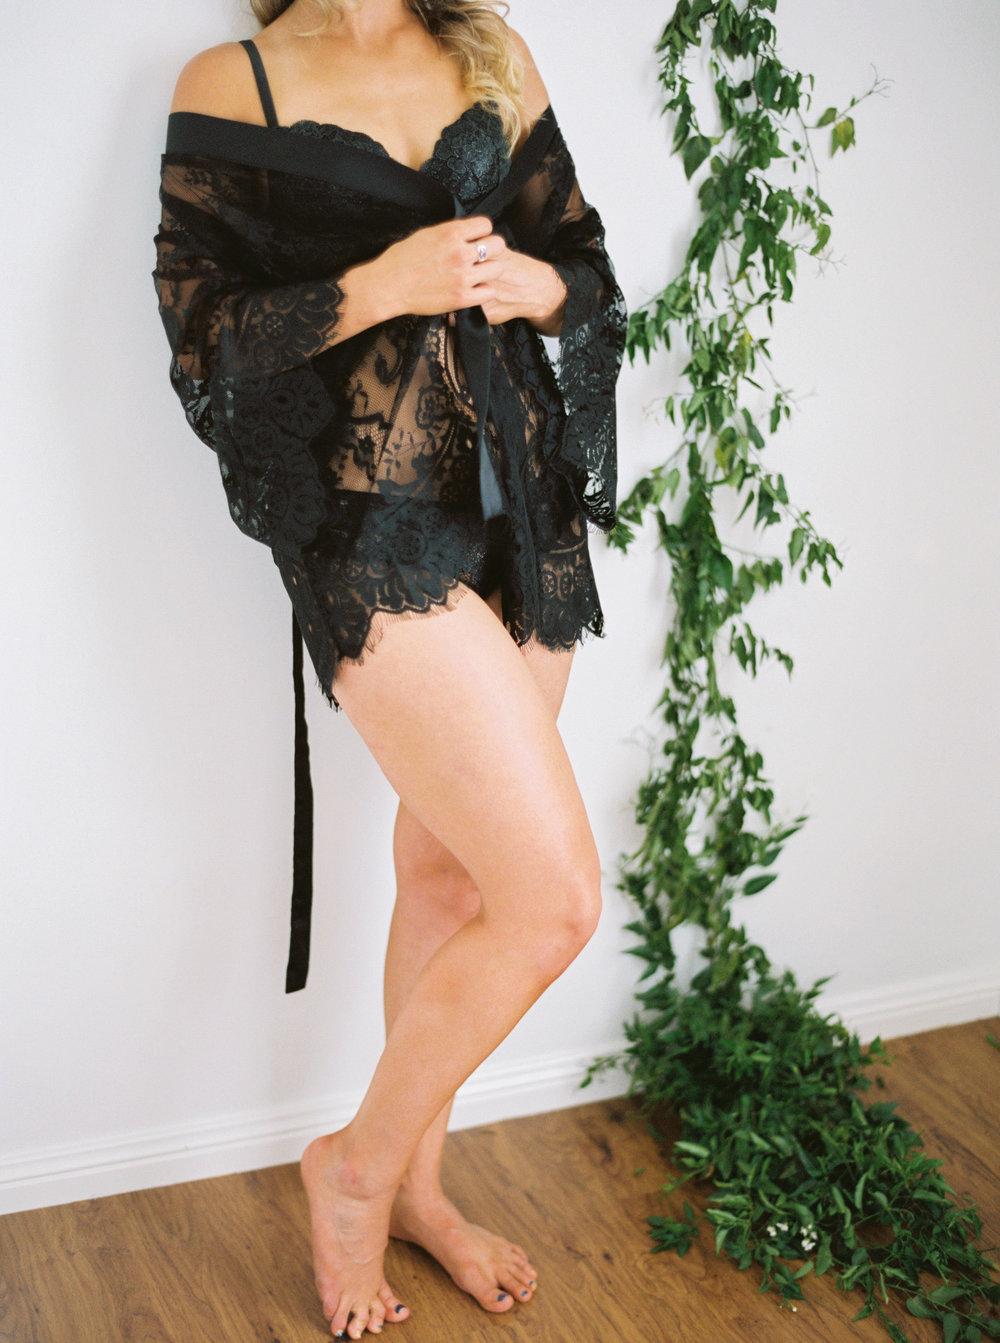 00011- Fine Art Film NSW Dubbo Mudgee Orange Bridal Boudoir Wedding Photographer Sheri McMahon in black lace lingere_.jpg